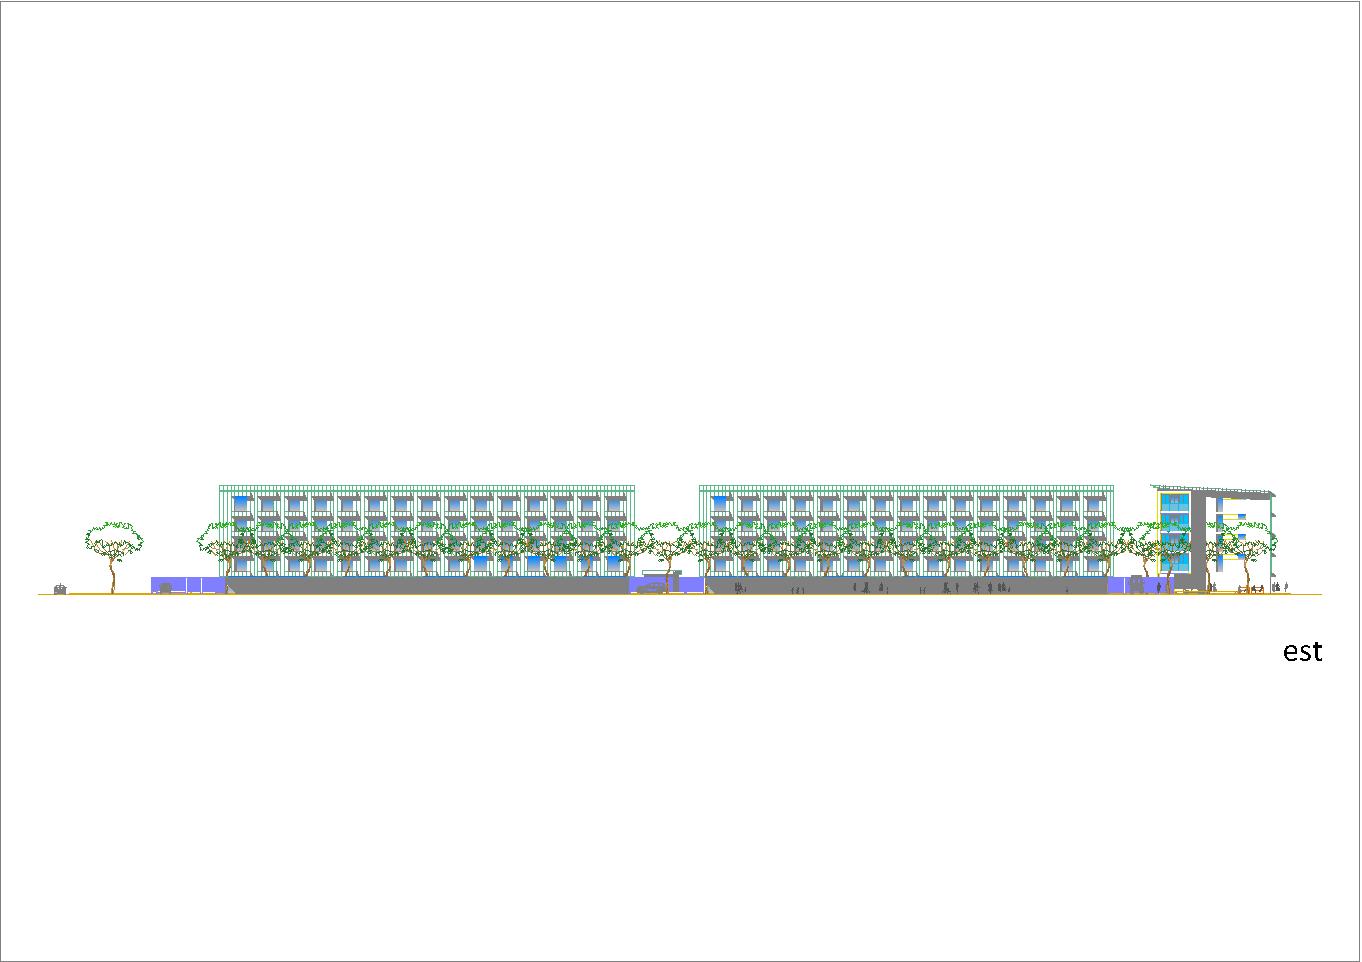 zzz22222coronavirus-modello.png-8